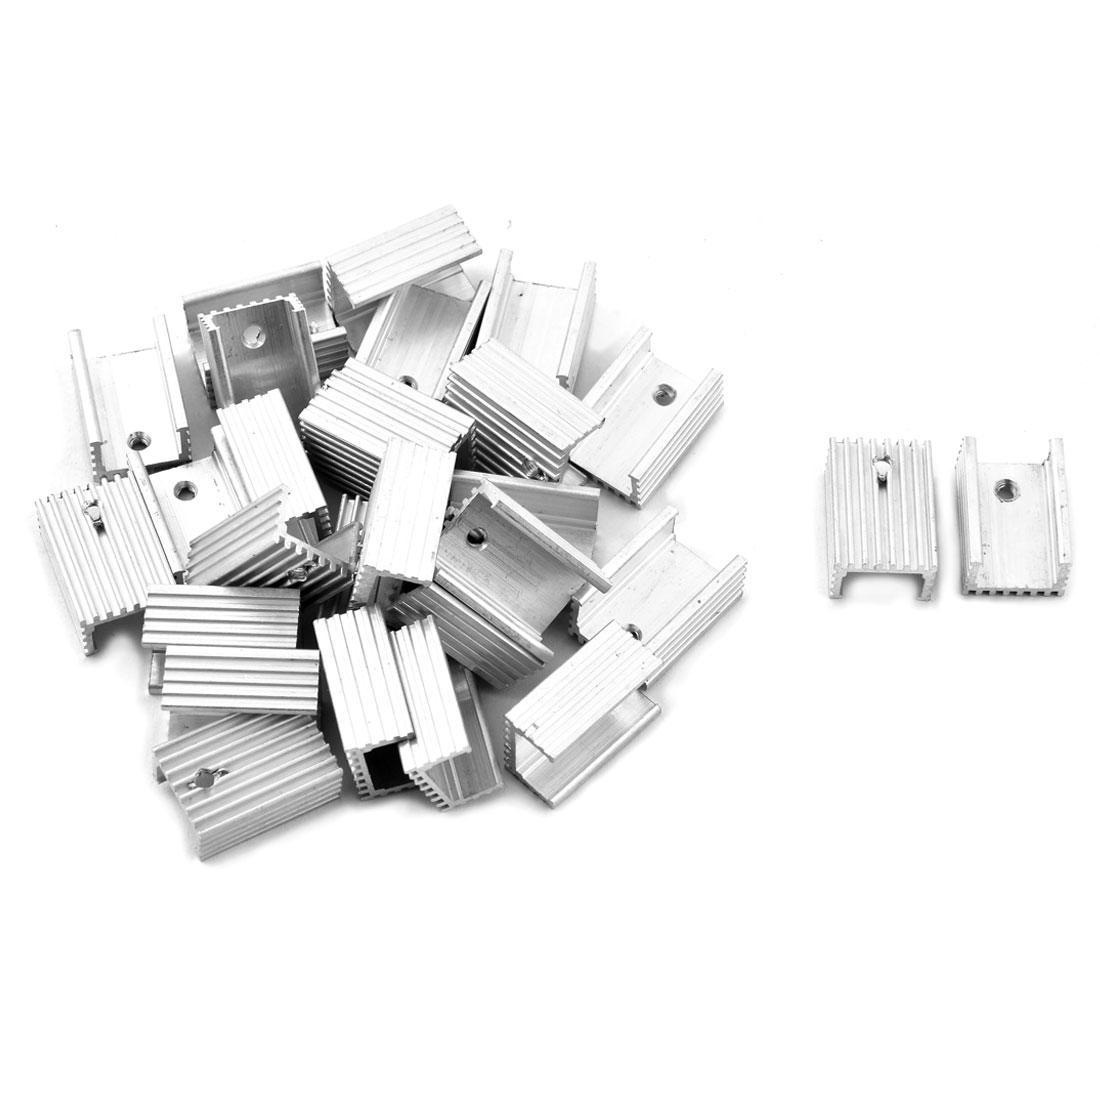 Aluminium Heatsink Cooling Fin Cooler Silver Tone 22mm x 15mm x 10mm 28 Pcs